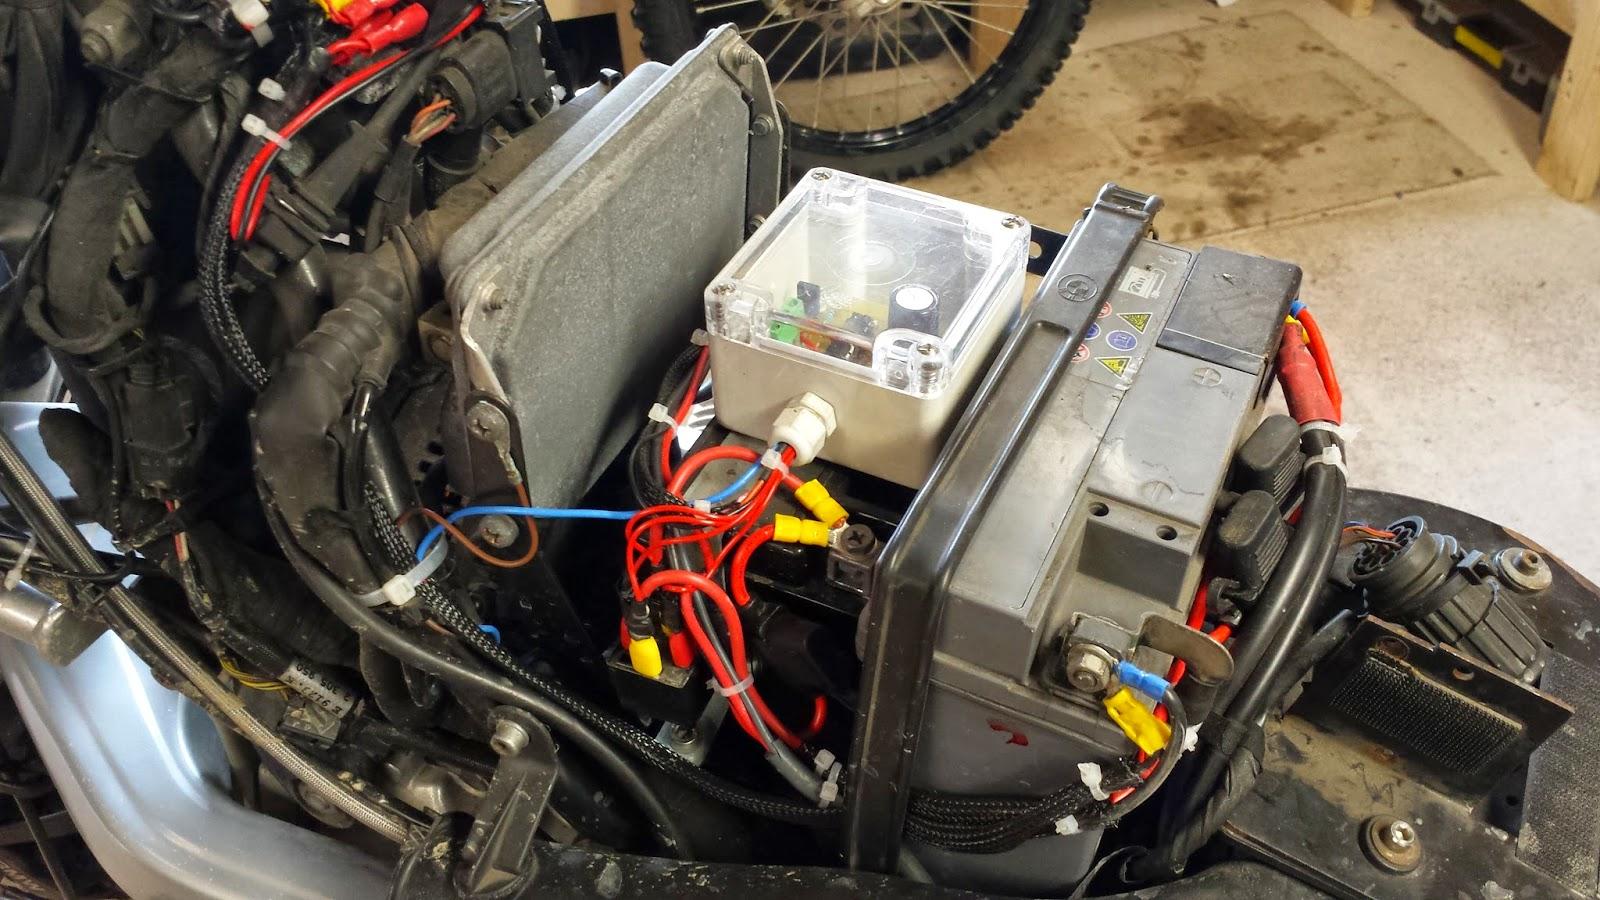 Wiring Cigarette Lighter Socket On Motorcycle